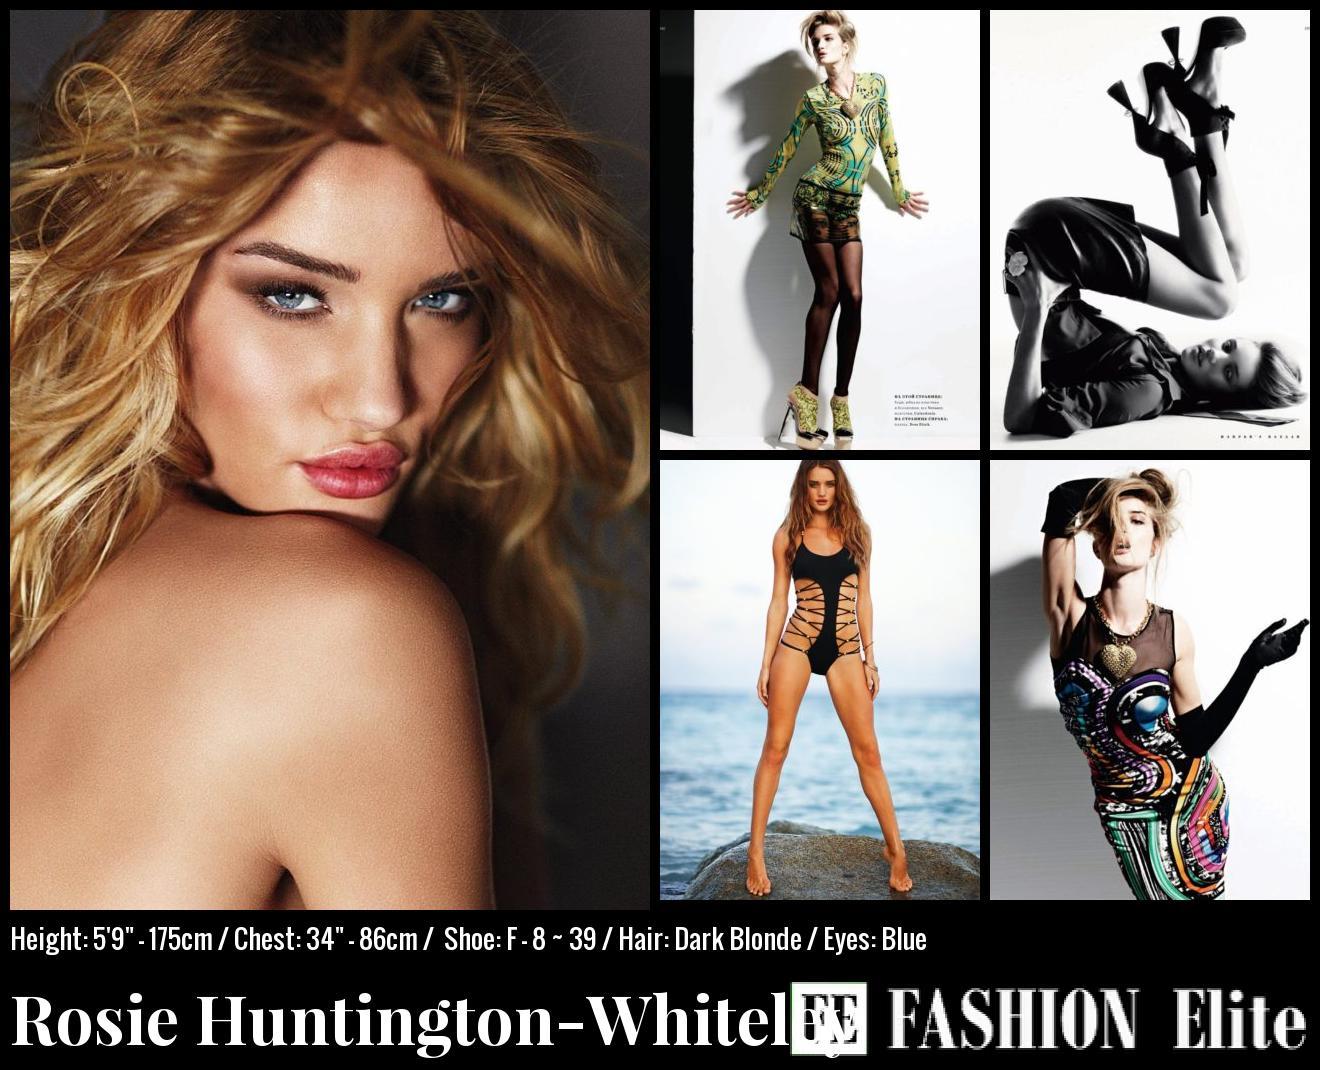 Rosie Huntington-Whiteley Comp Card